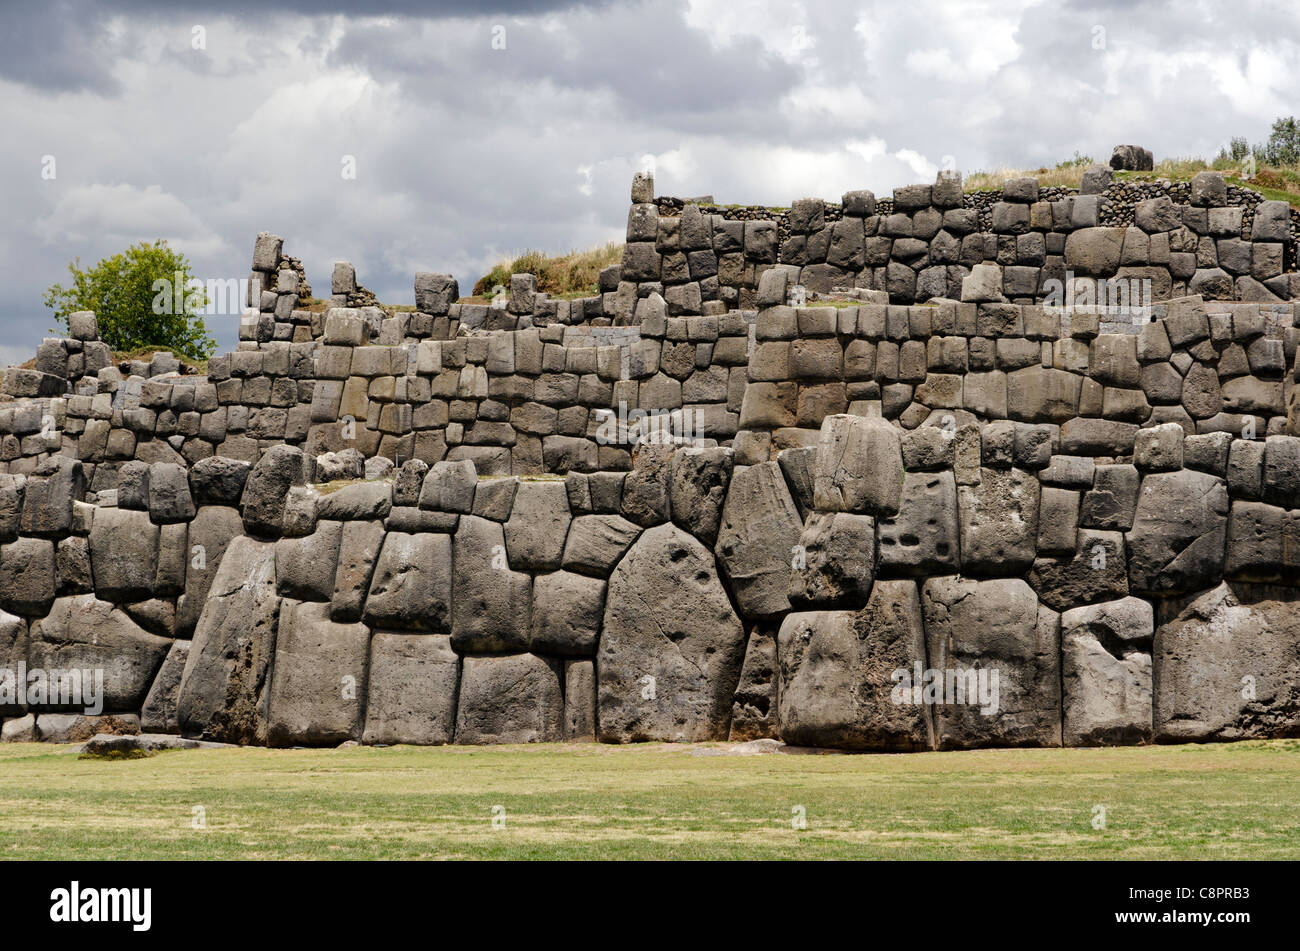 Limestone blocks at the ruins of Sacsayhuaman Cusco Peru - Stock Image